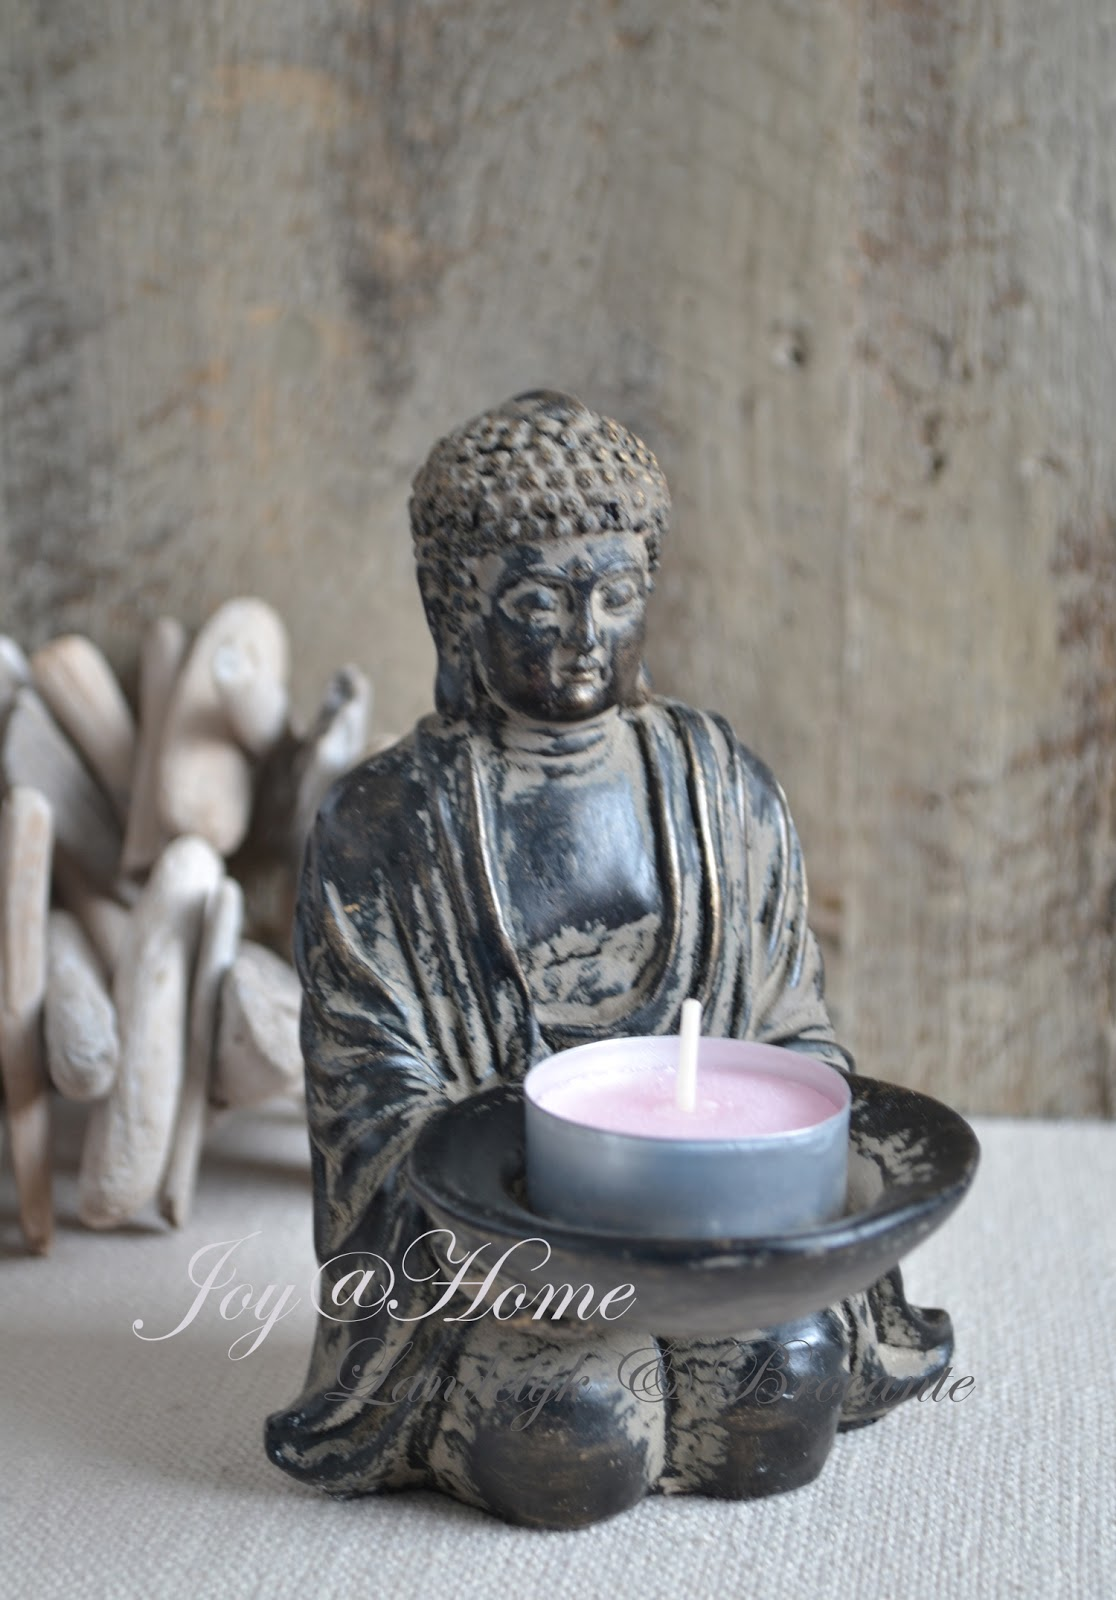 Joy@home woonaccessoires blog  december 2012